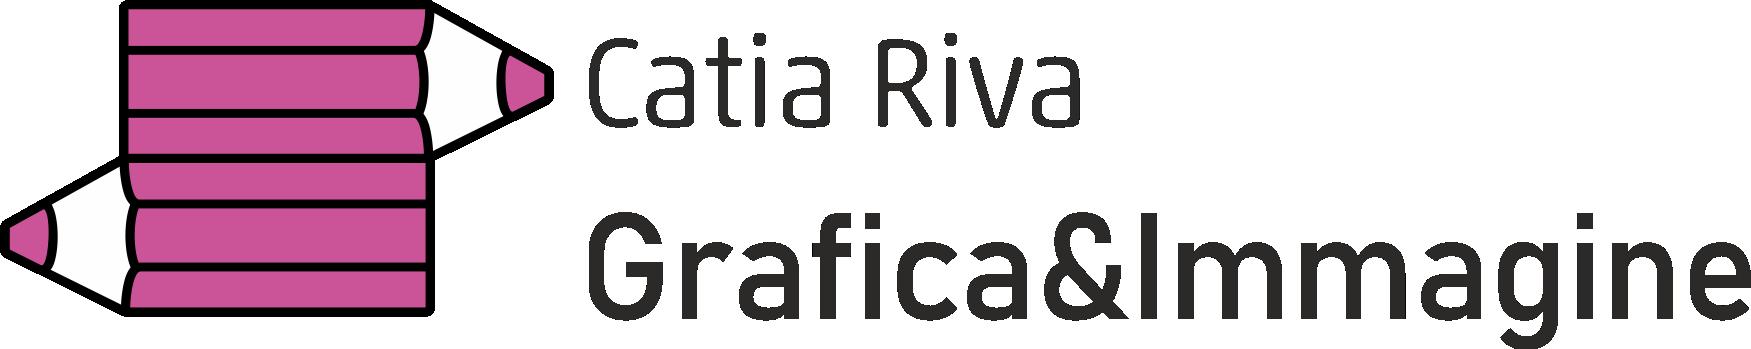 Catia Riva